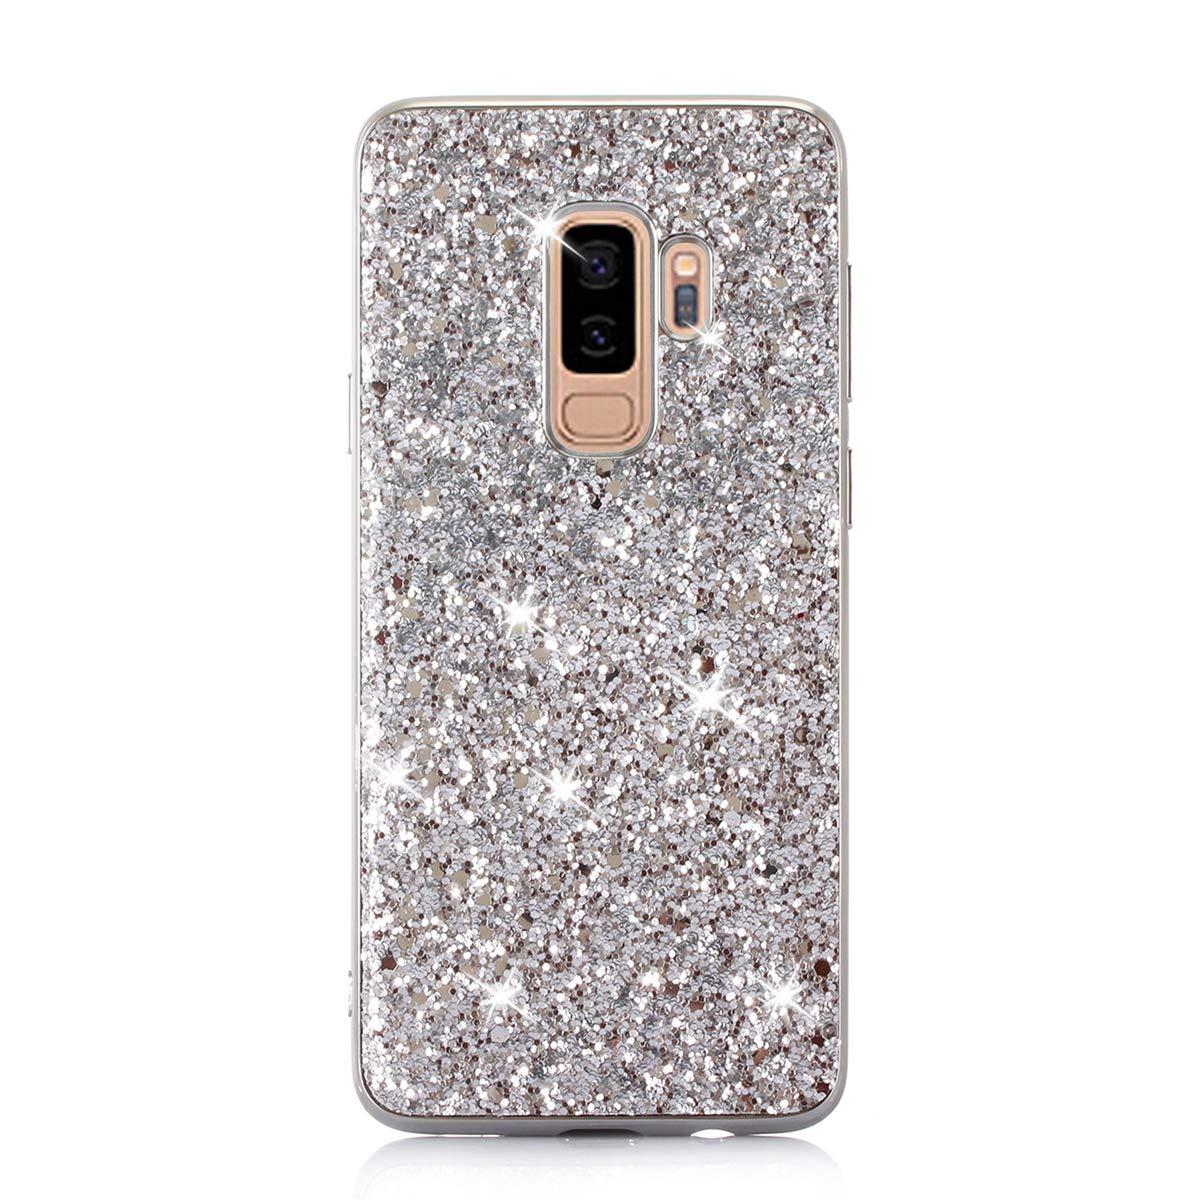 Felfy Coque Samsung Galaxy S9 Plus,Coque Galaxy S9 Plus Glitter Etui,Samsung S9 Plus Glitter Luxe Bling Shiny /Étincelle Paillette TPU Silicone /& PC Bumper Ultra Slim Anti-Choc Couverture,Bleu